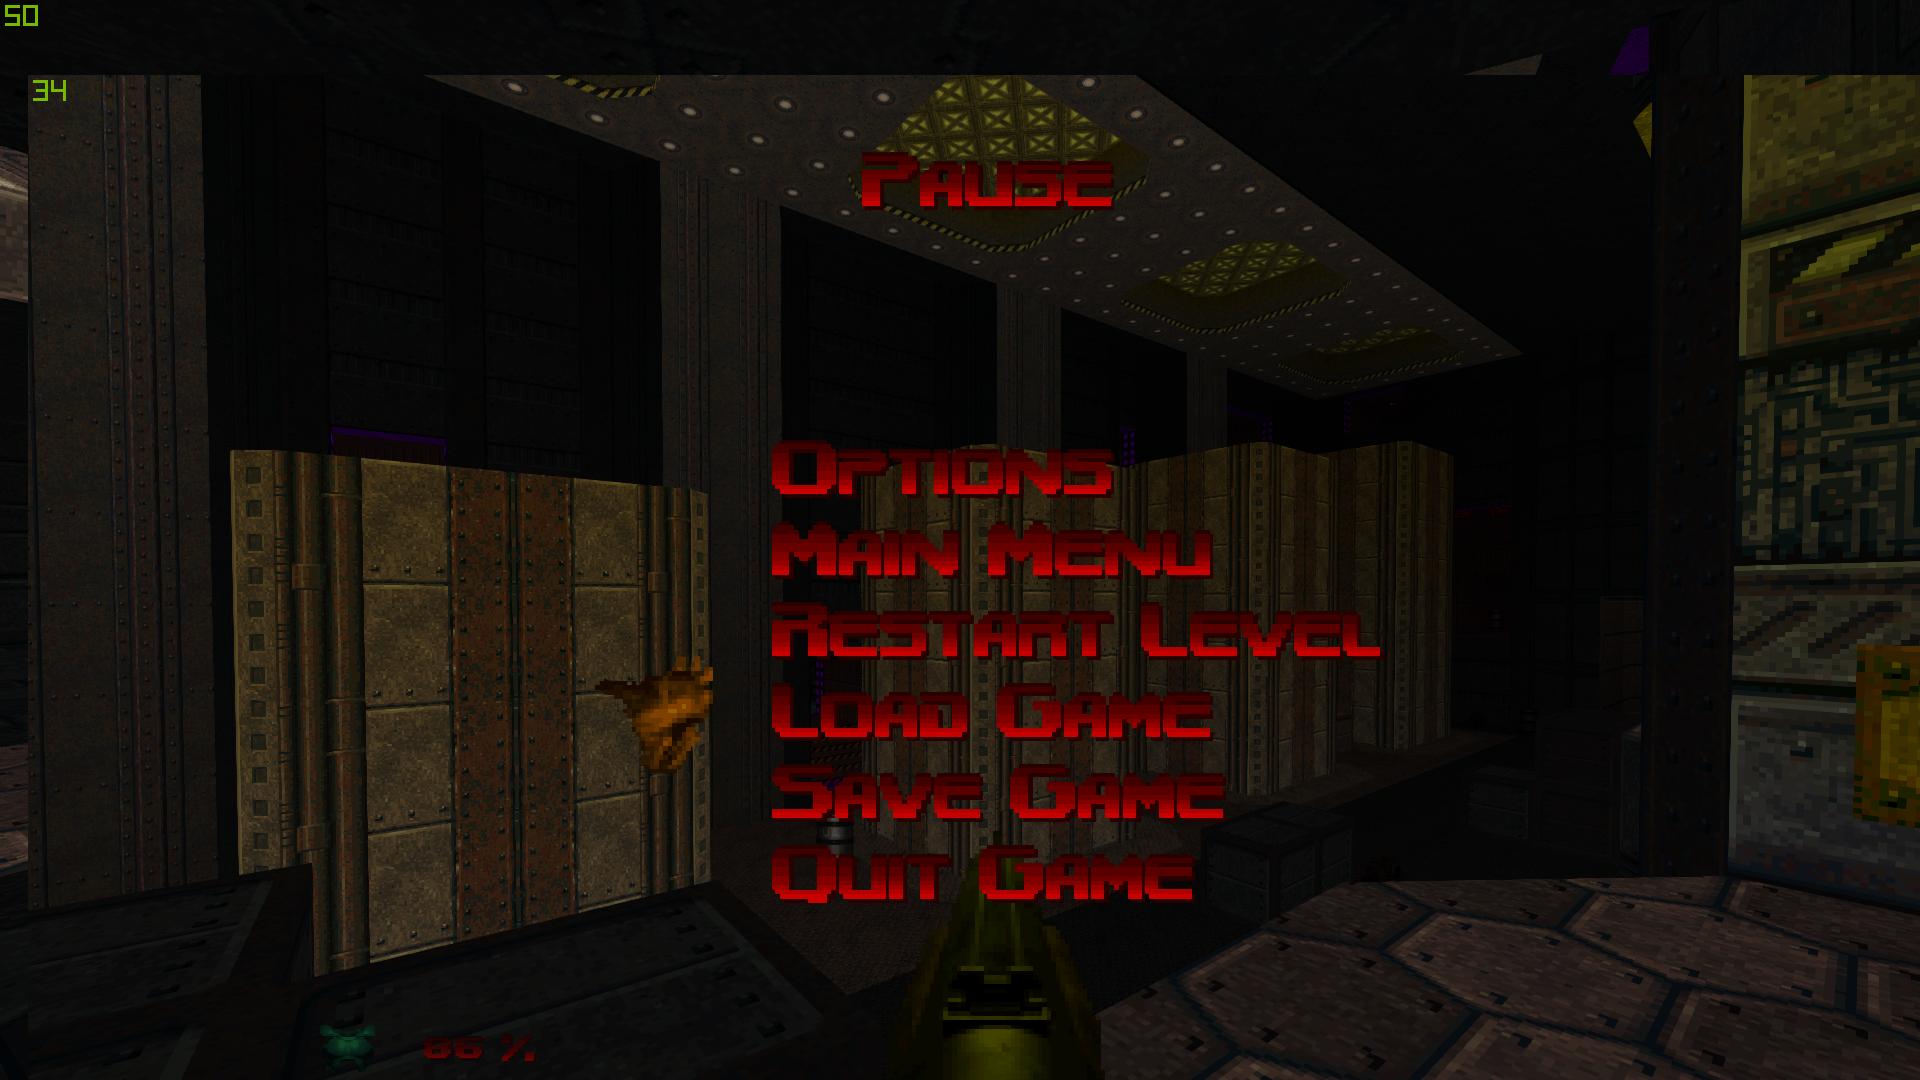 Doom_64_EX_MAP04_1.png.ac0a0cc12b19e2f0d4738da010c86334.png